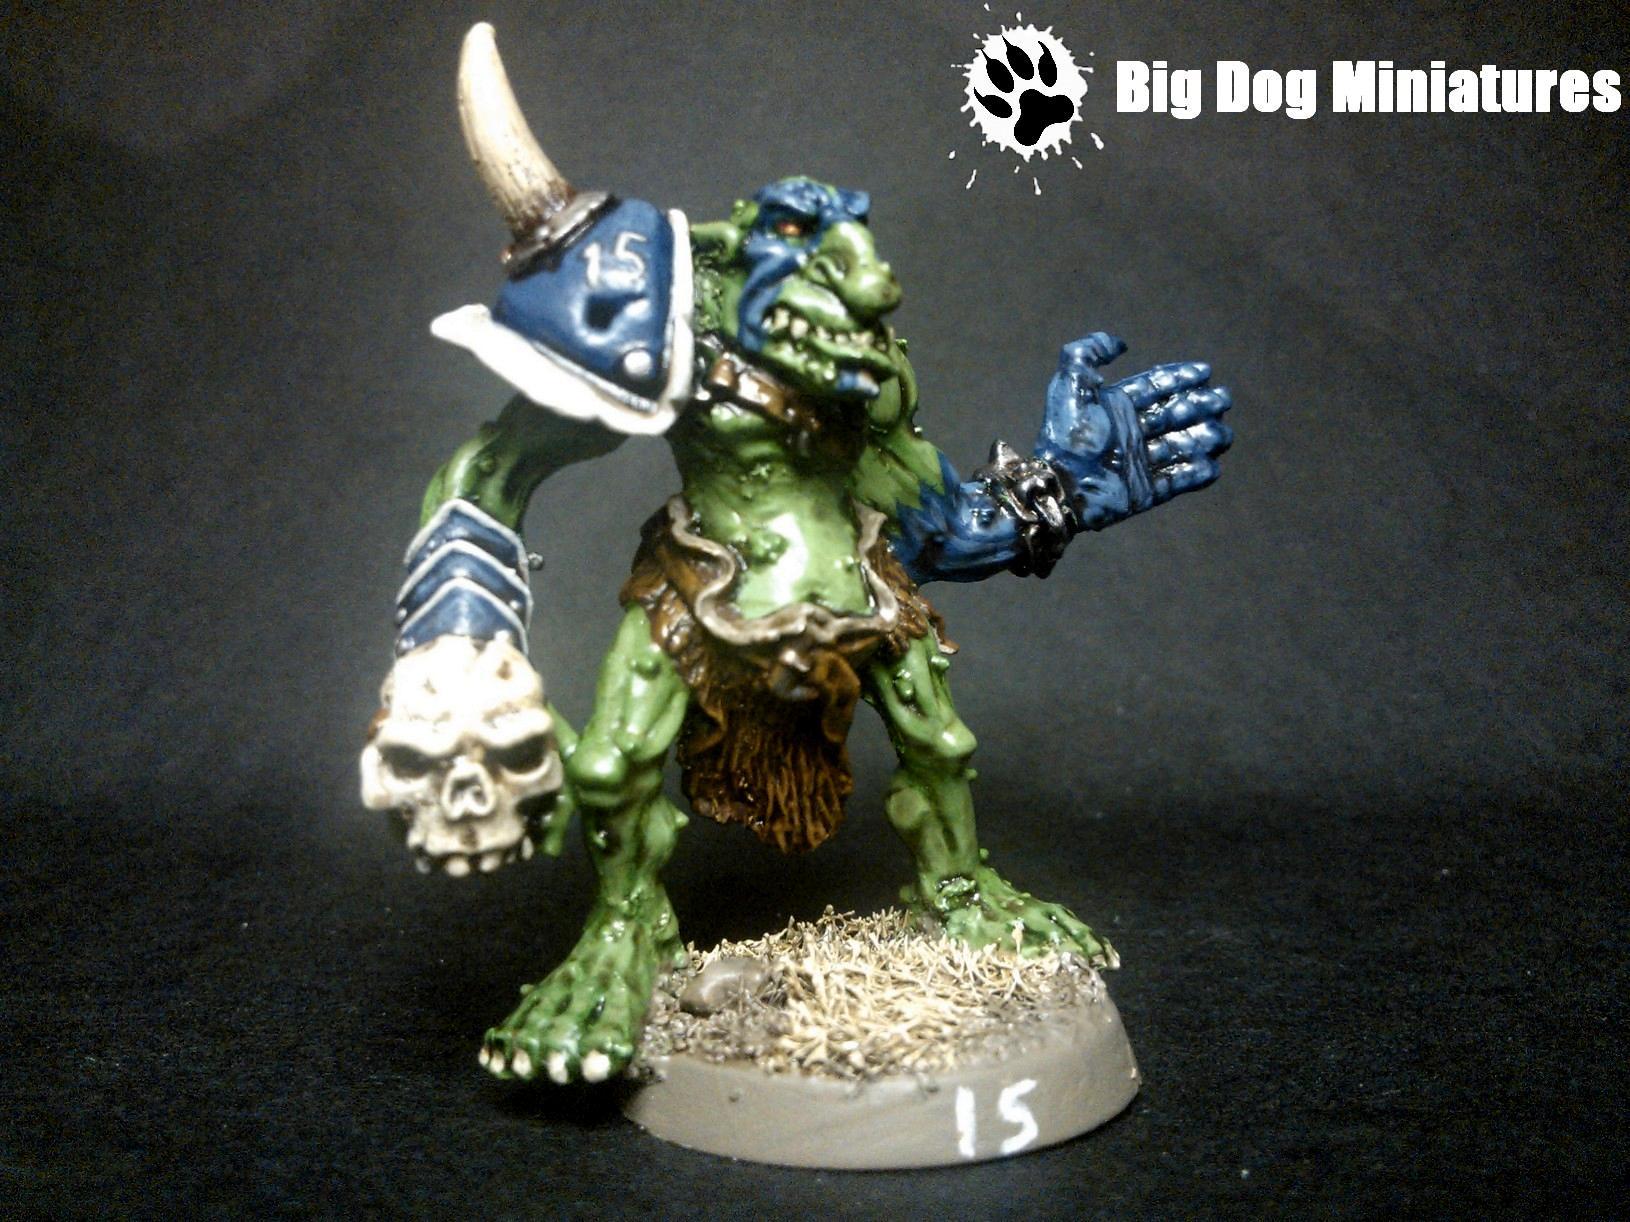 Big Dog Miniatures, Blood, Bowl, Cheerleader, Goblins, Skull, Troll, War Paint